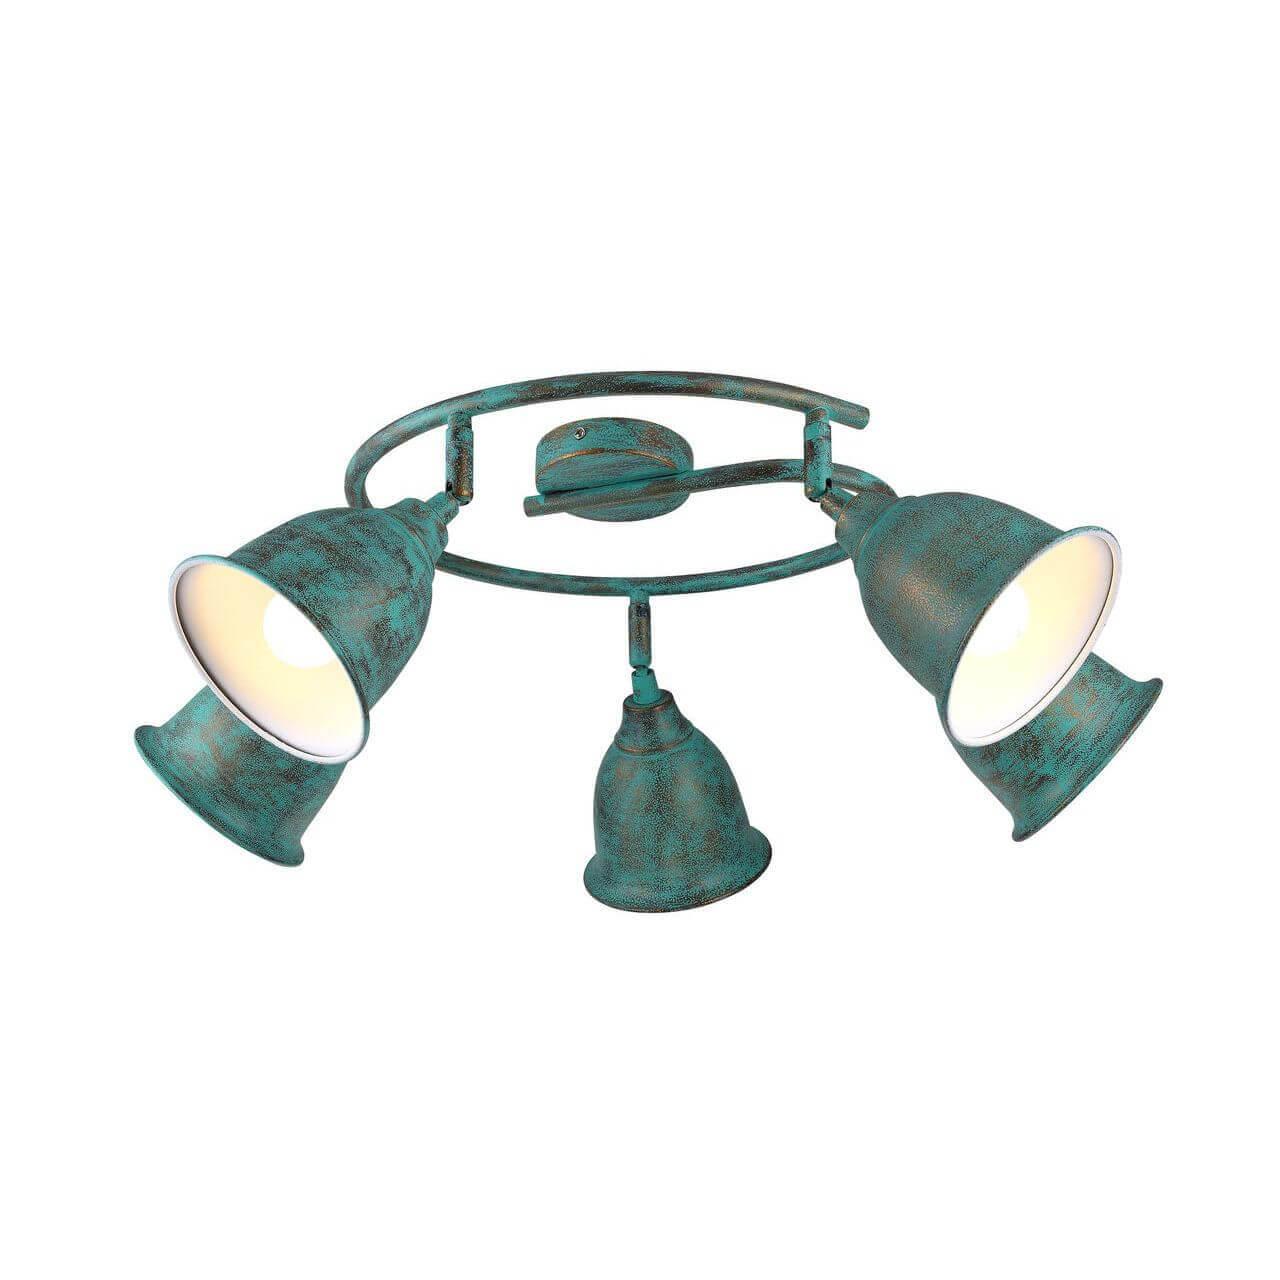 Спот Arte Lamp A9557PL-5BG Campana BG